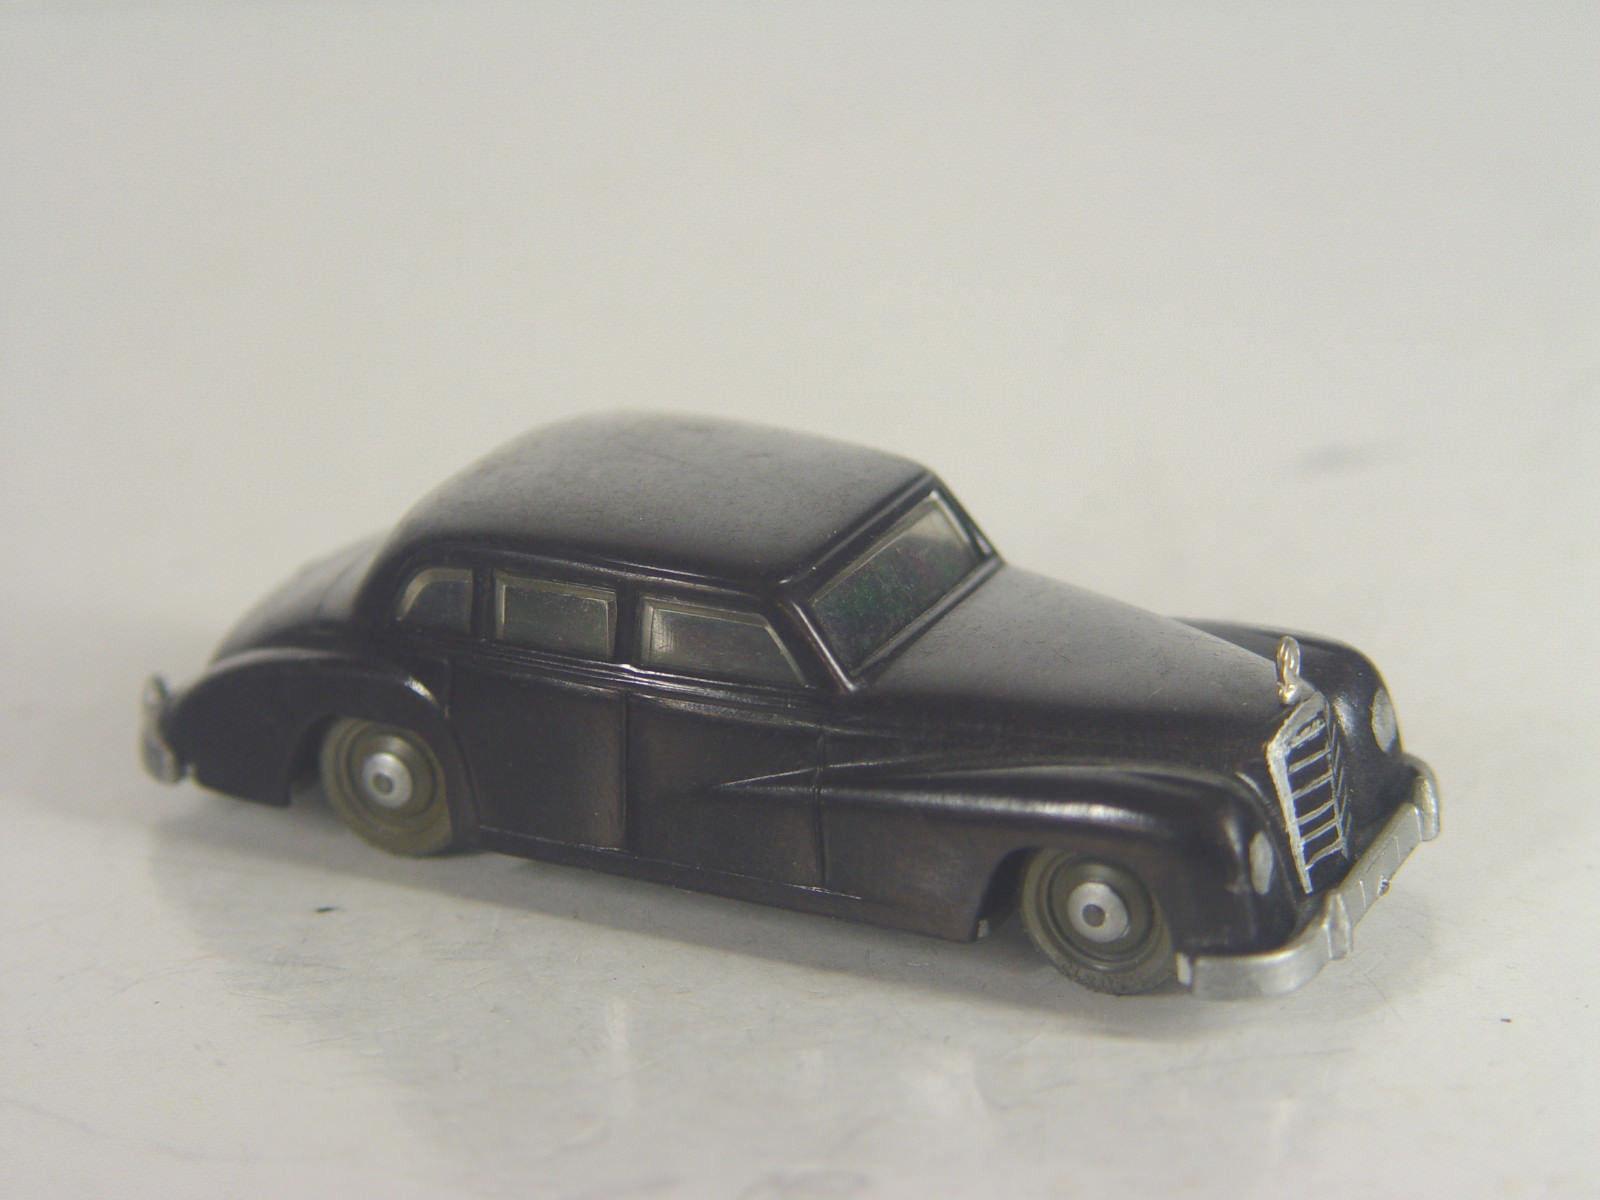 Mercedes 300 en negro-Siko modelo 8,3 cm -  1850   e-Gebr.